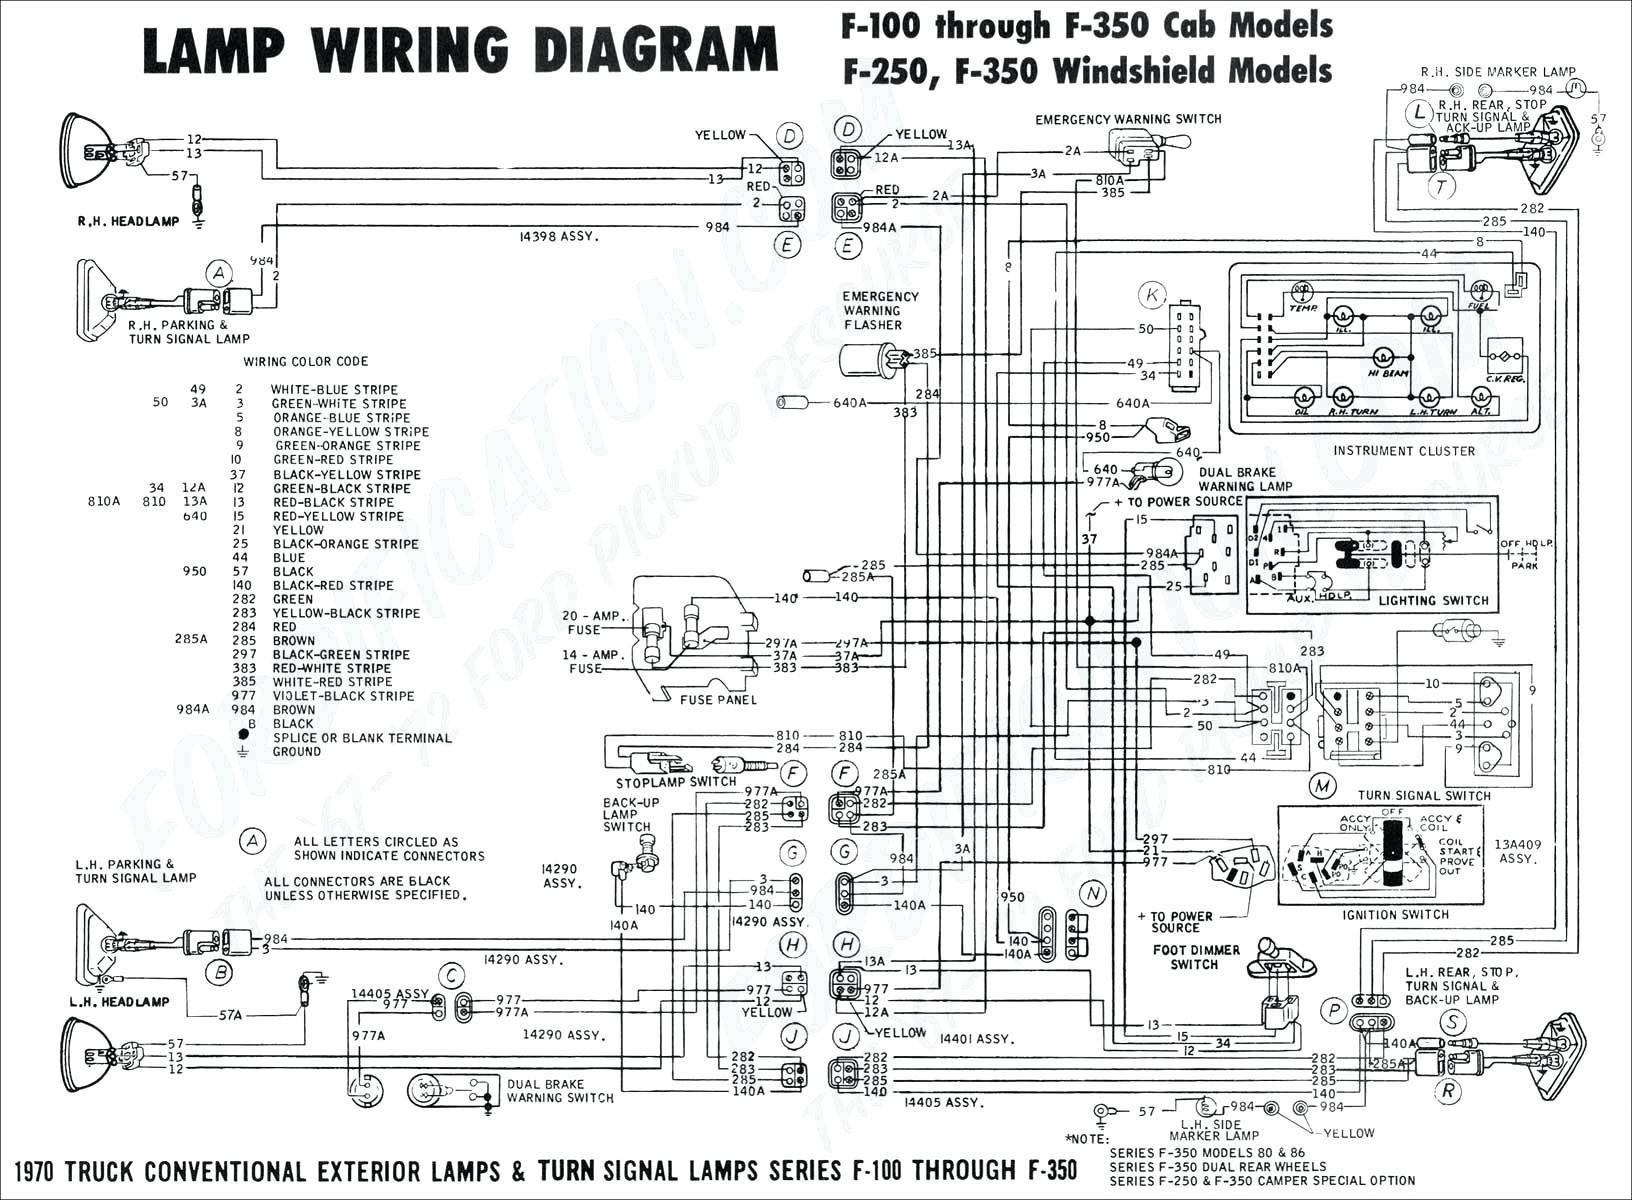 83 toyota voltage regulator wiring wiring diagram toolbox 83 toyota voltage regulator wiring share circuit diagrams